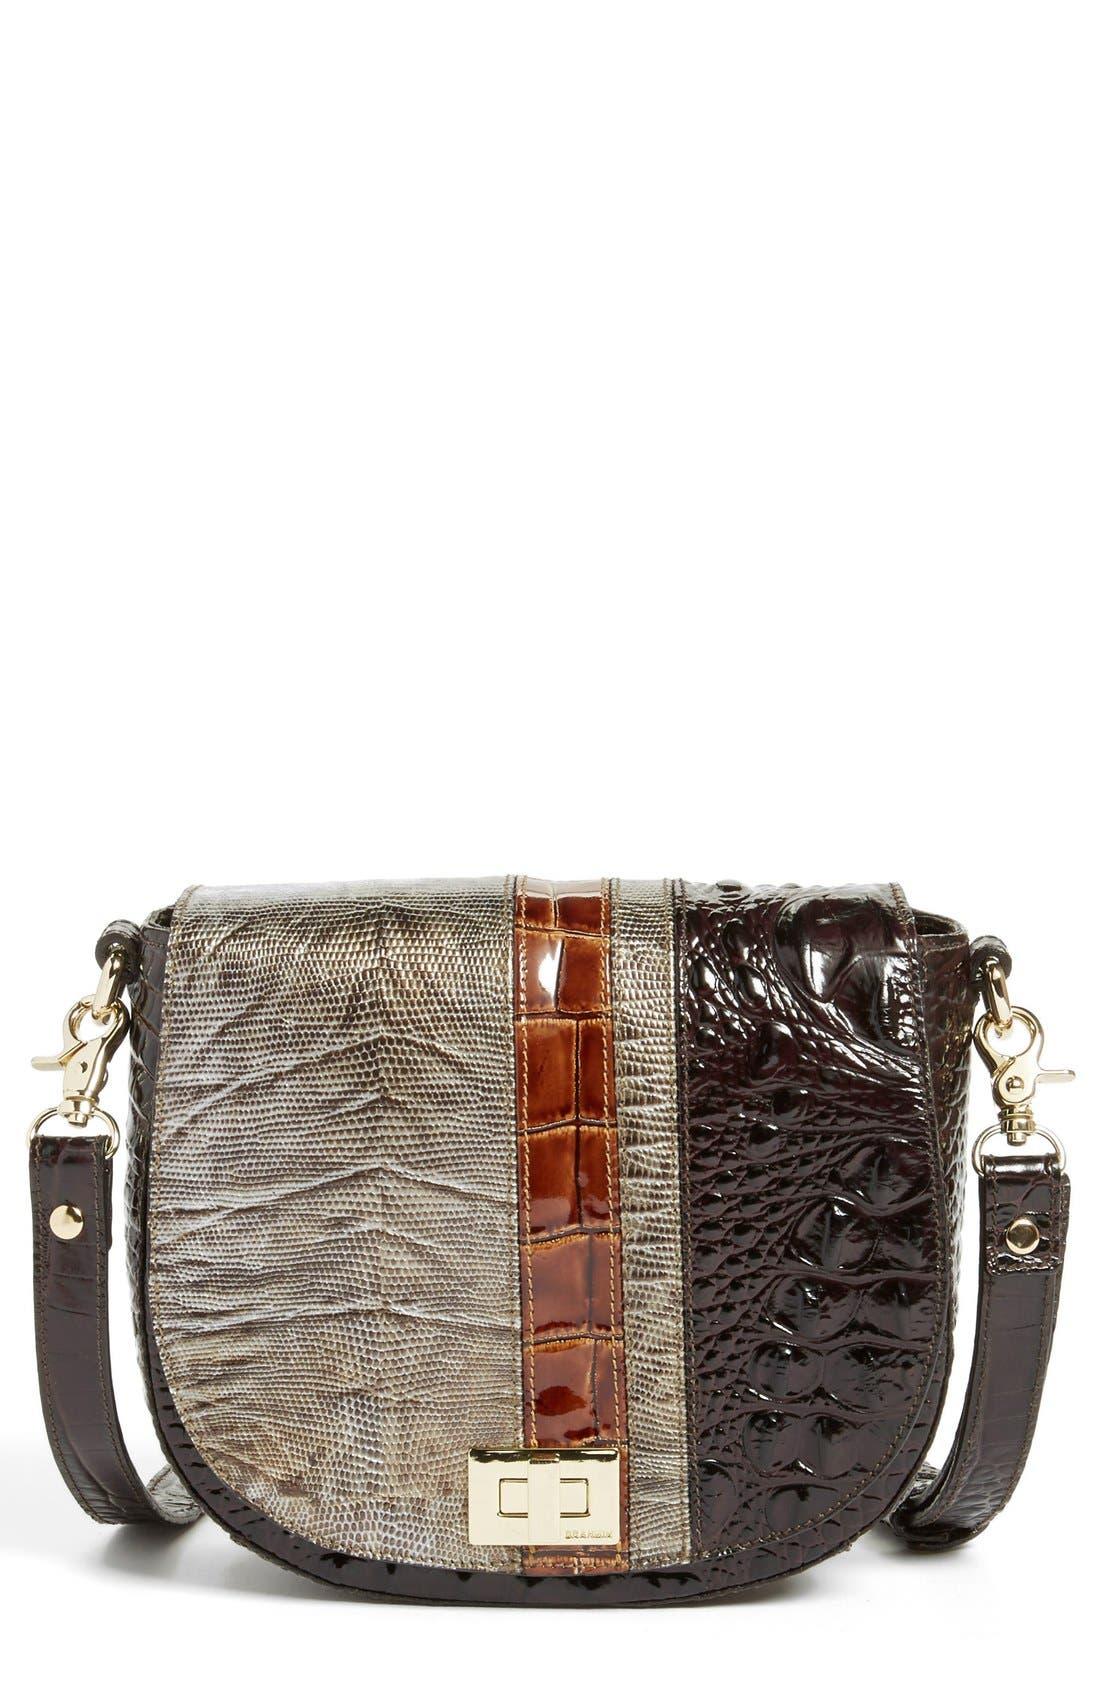 Main Image - Brahmin 'Tillie' Embossed Leather Crossbody Bag (Nordstrom Exclusive)